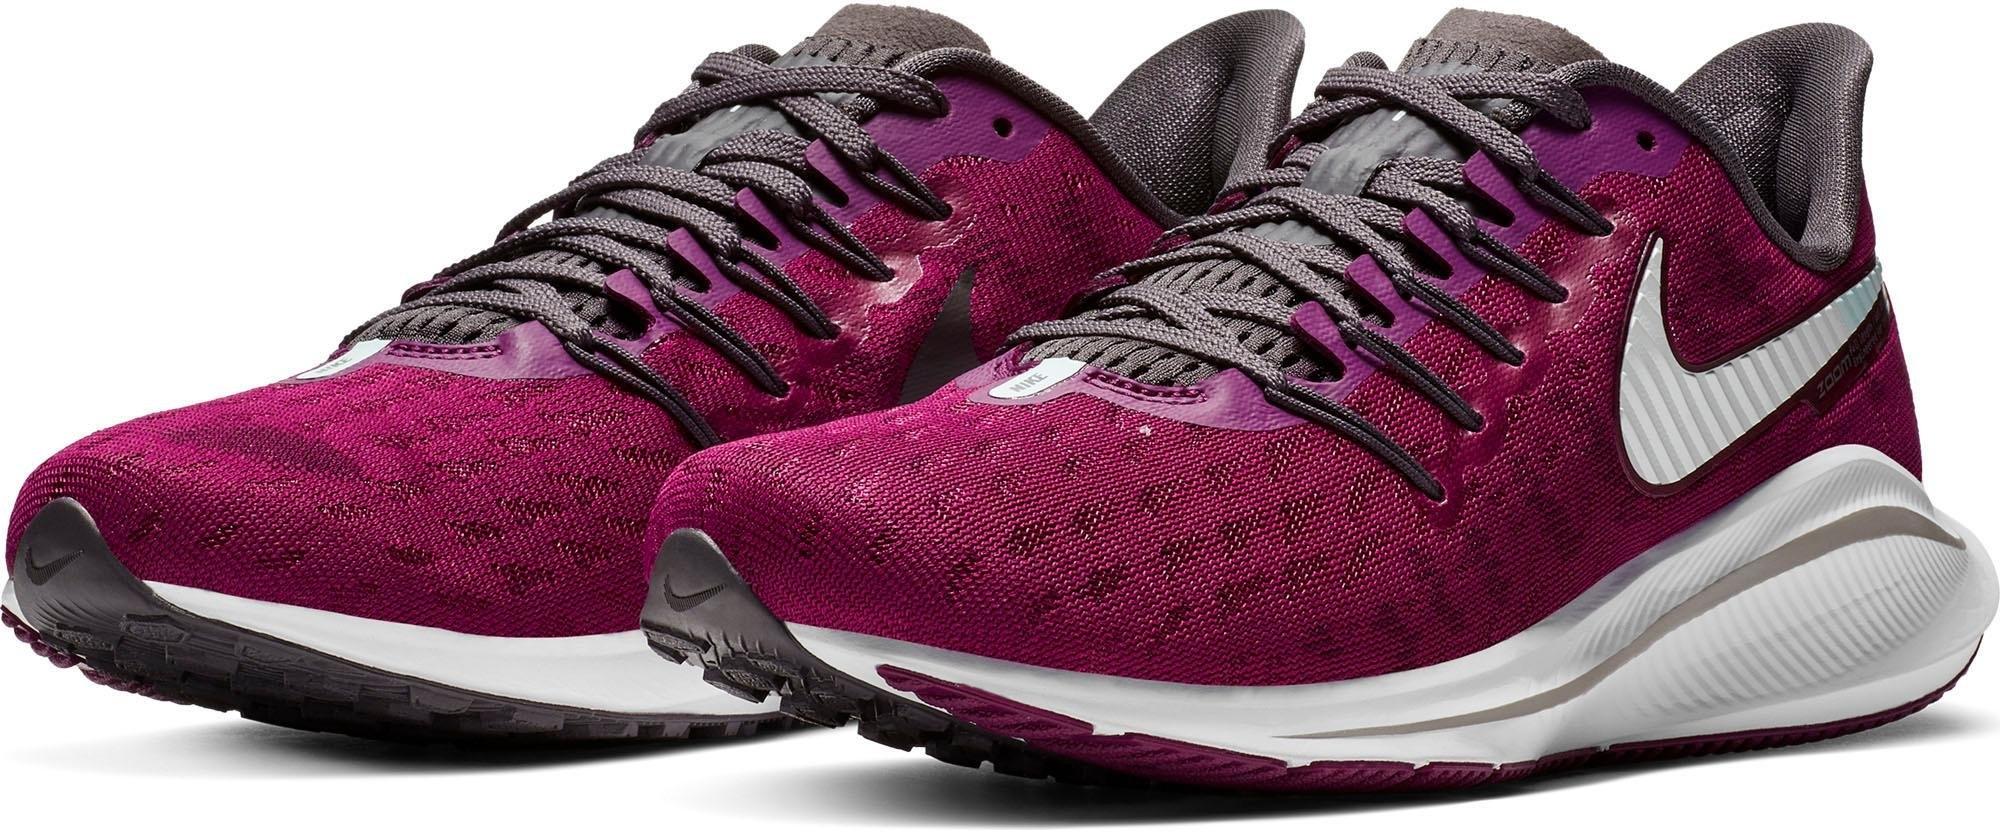 Nike runningschoenen »Wmns Air Zoom Vomero 14« - gratis ruilen op otto.nl